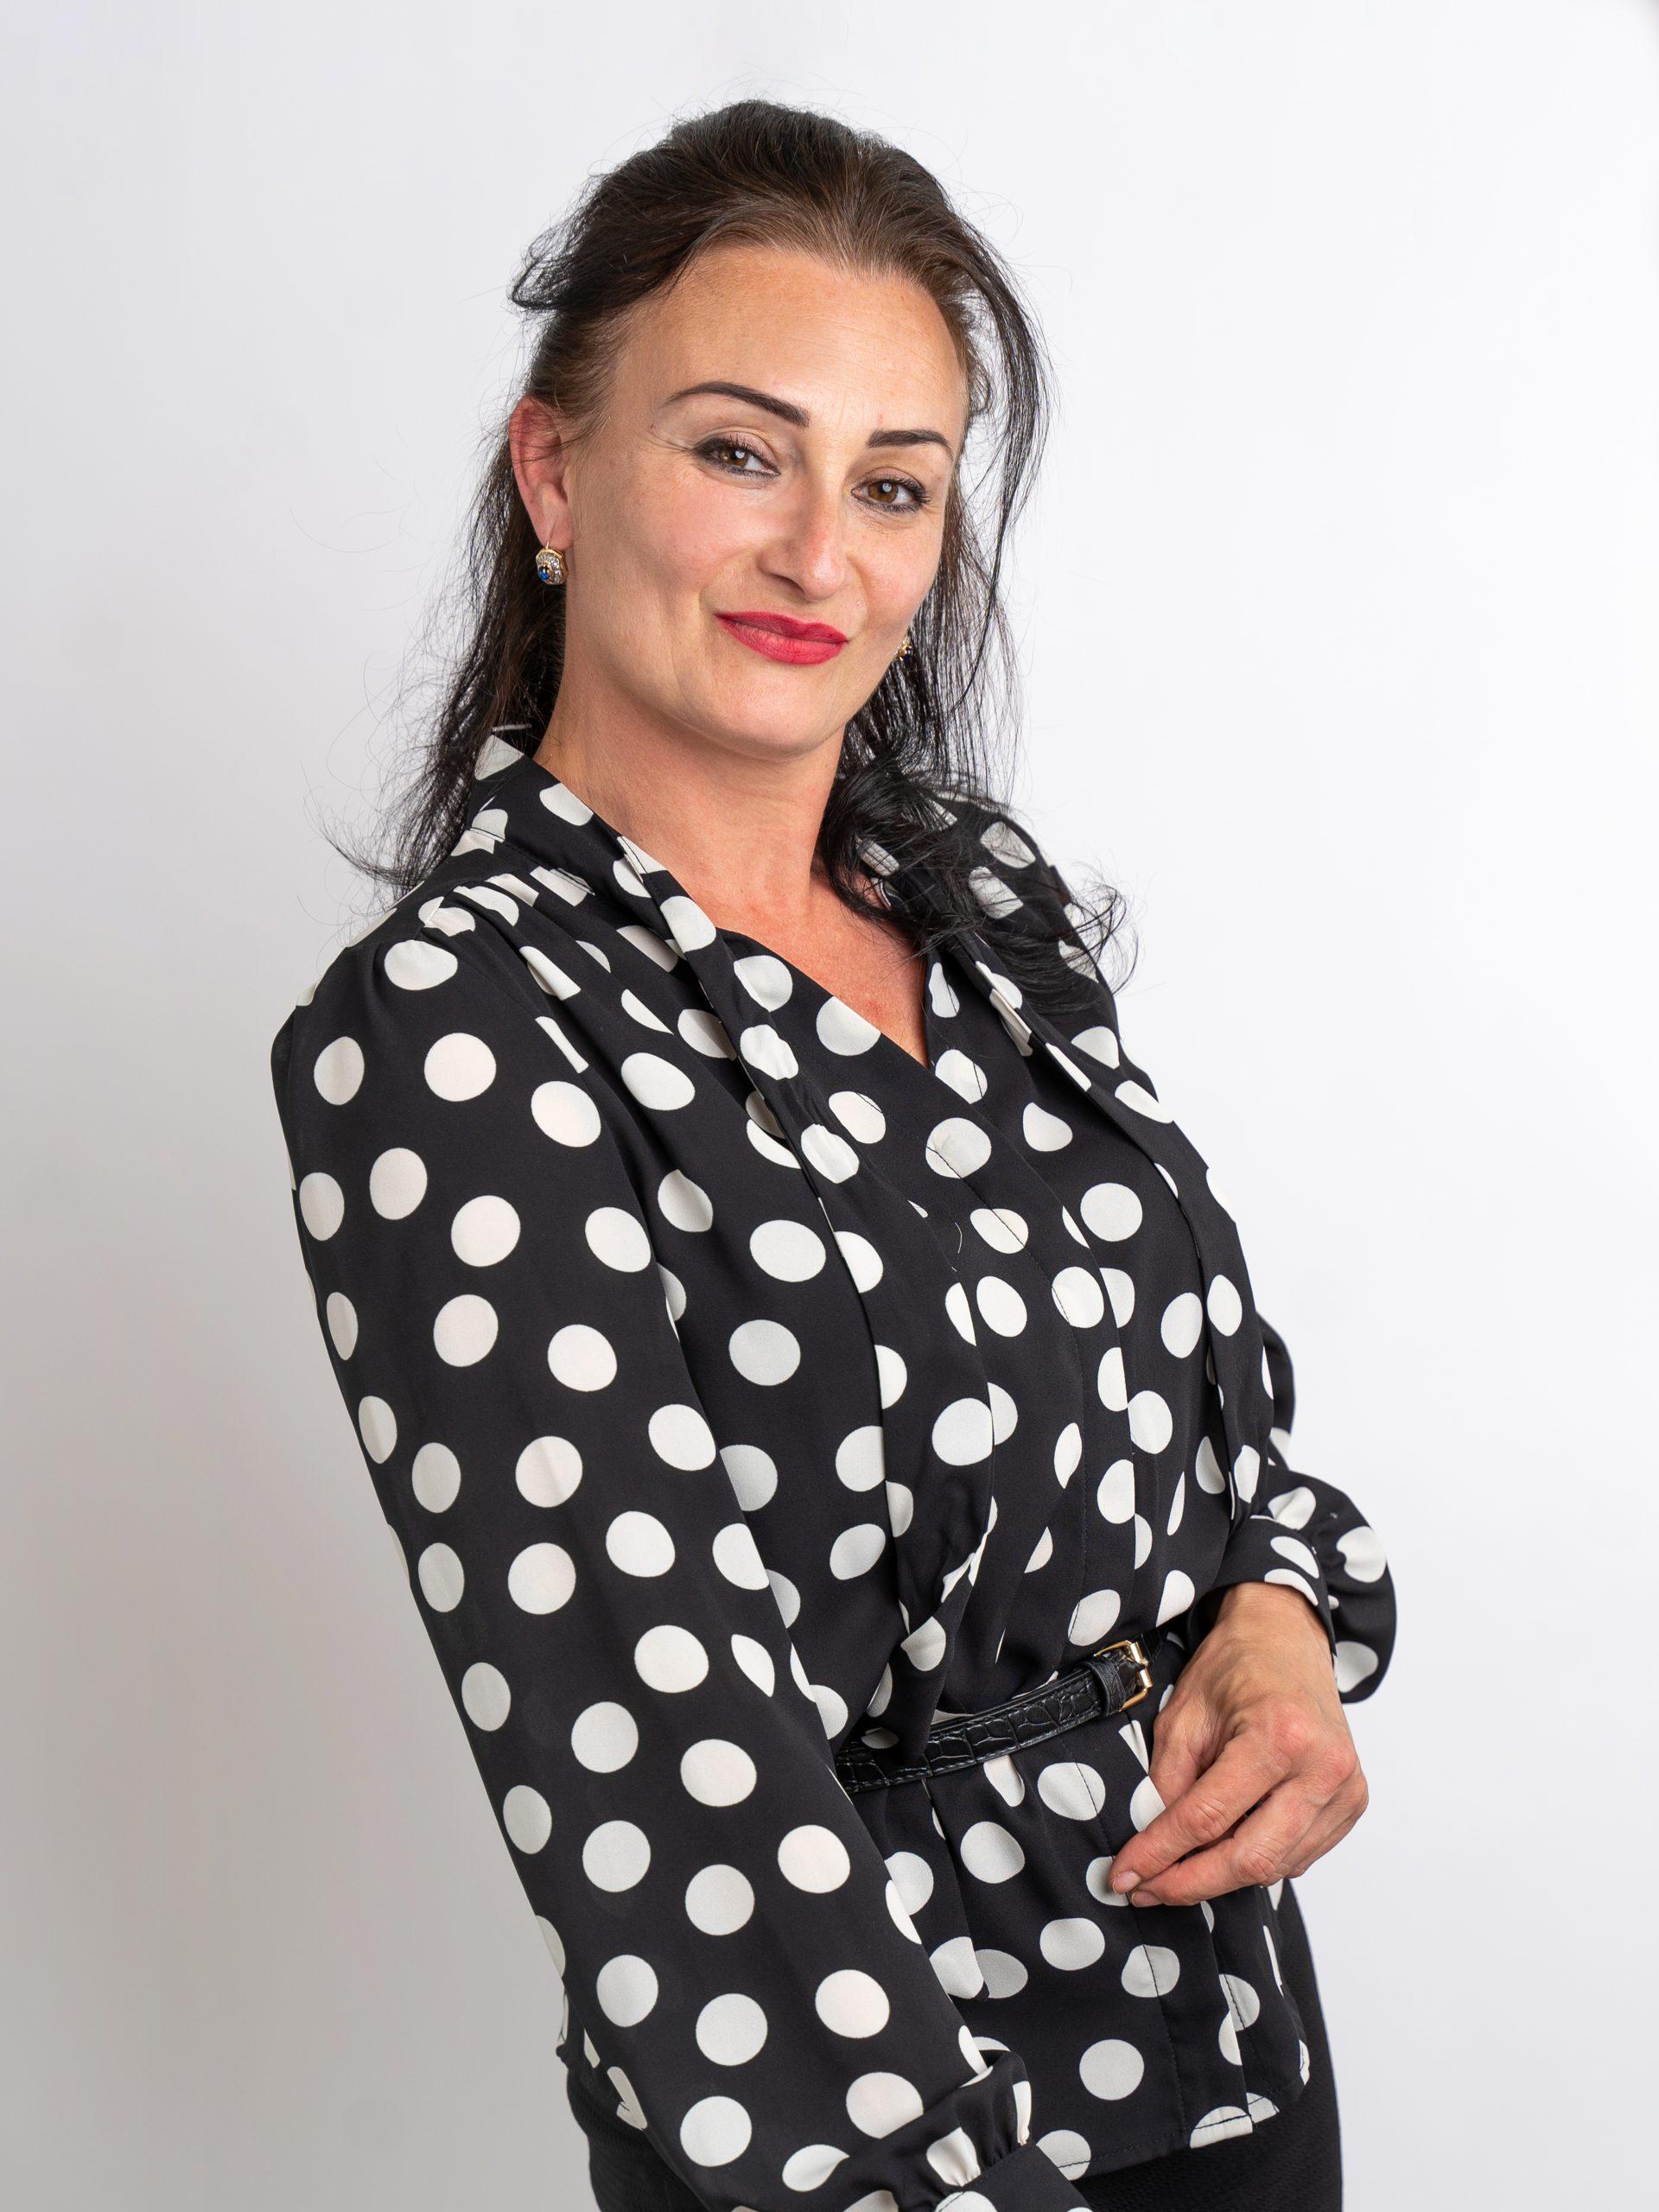 Radmila Karavajeva